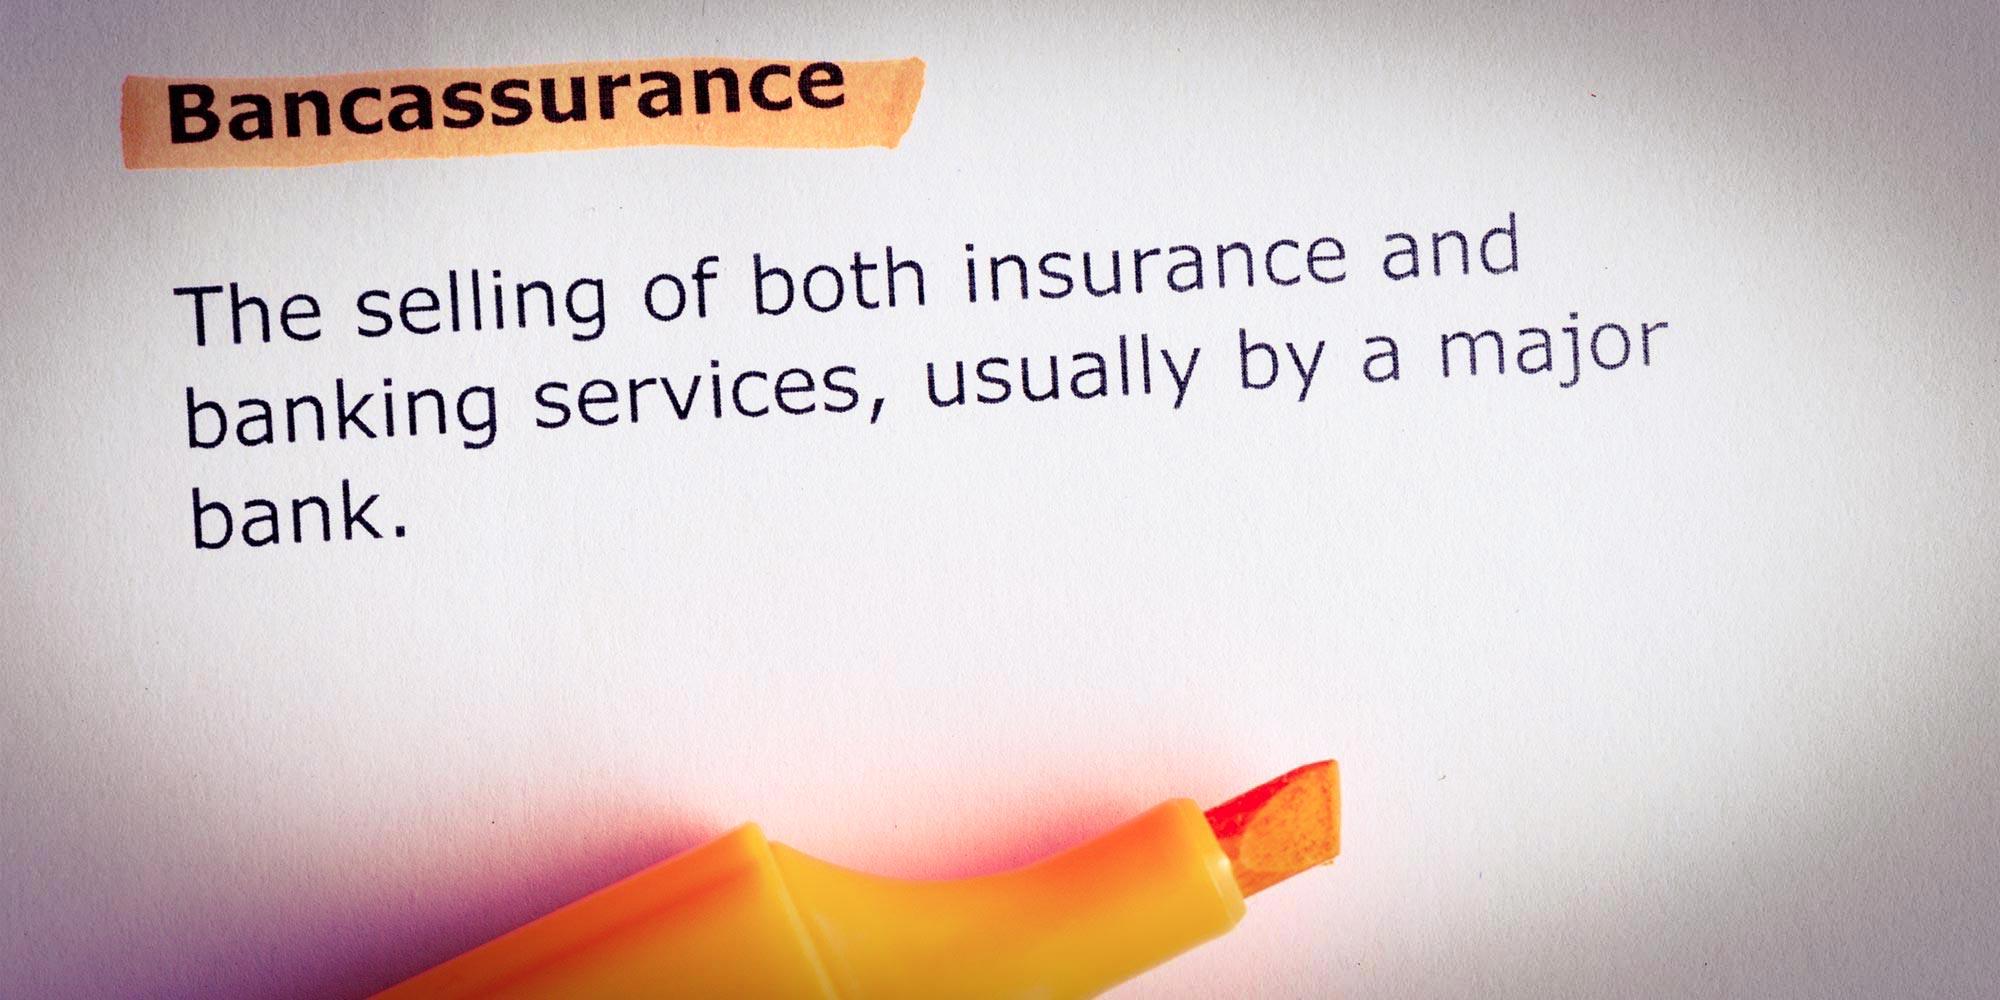 bancassurance-definition-bsurance